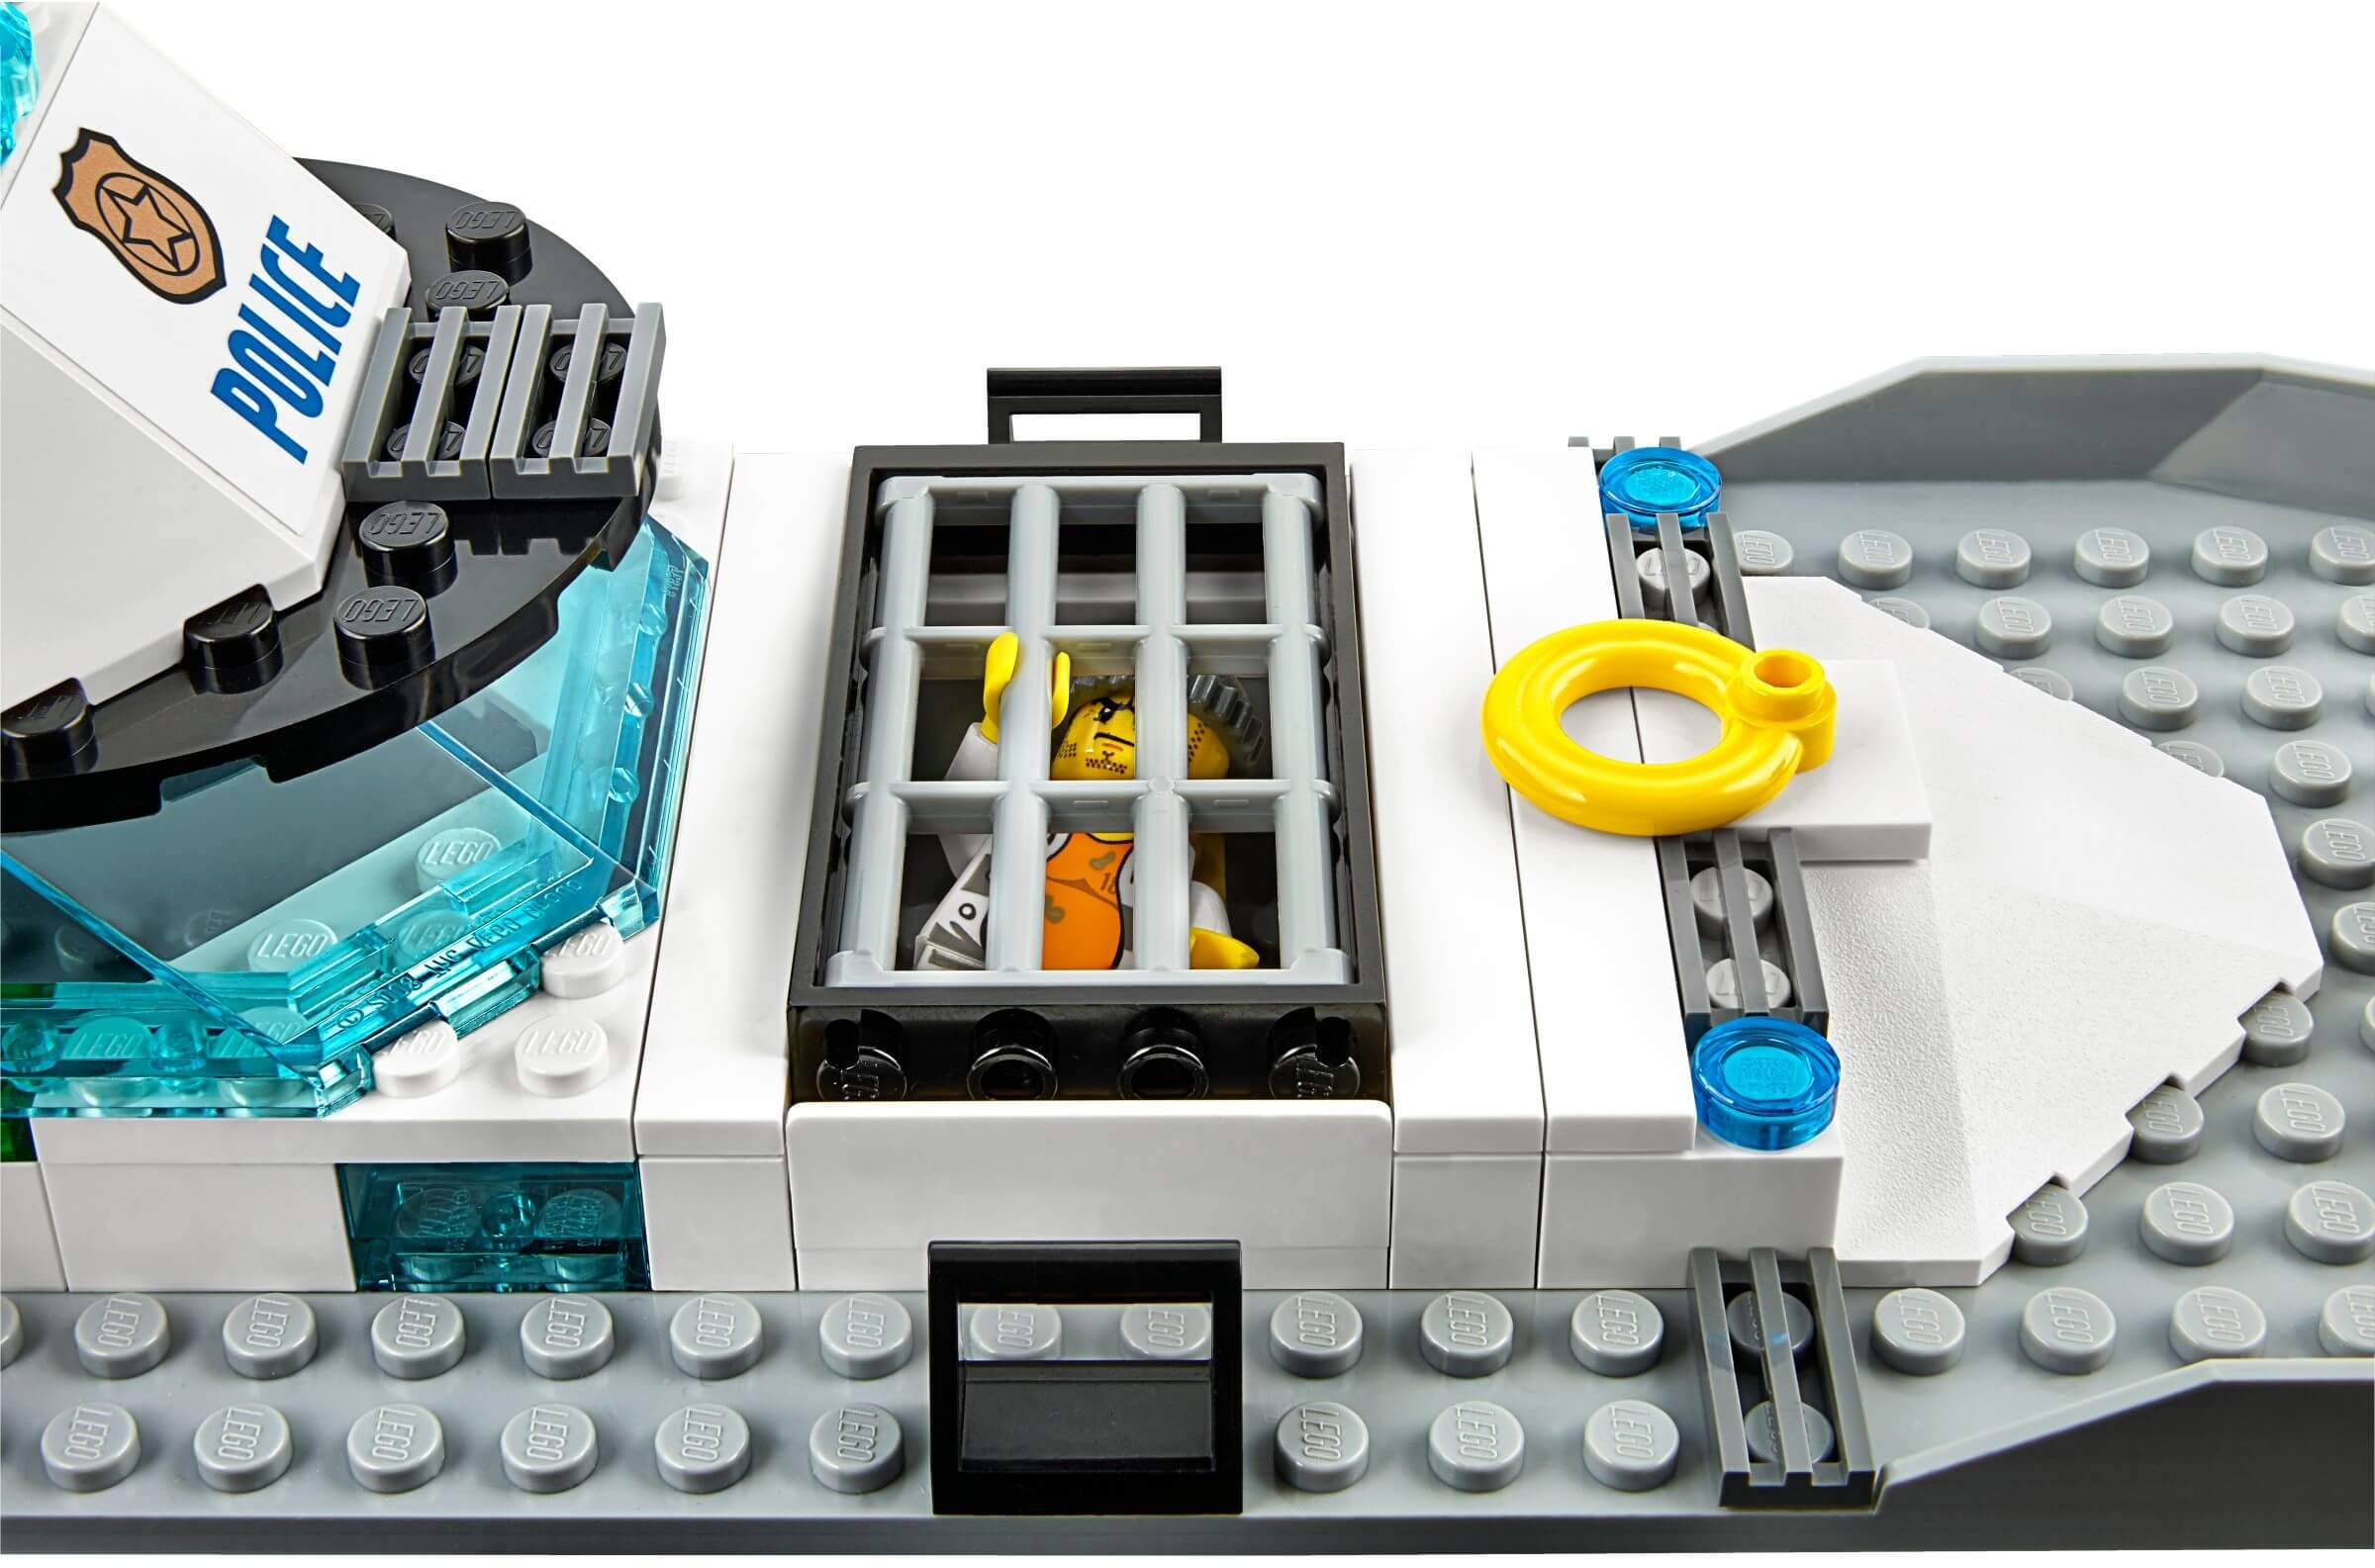 Mua đồ chơi LEGO 60129 - LEGO City 60129 - Tàu Cảnh Sát Tuần Tra (LEGO City Police Patrol Boat 60129)